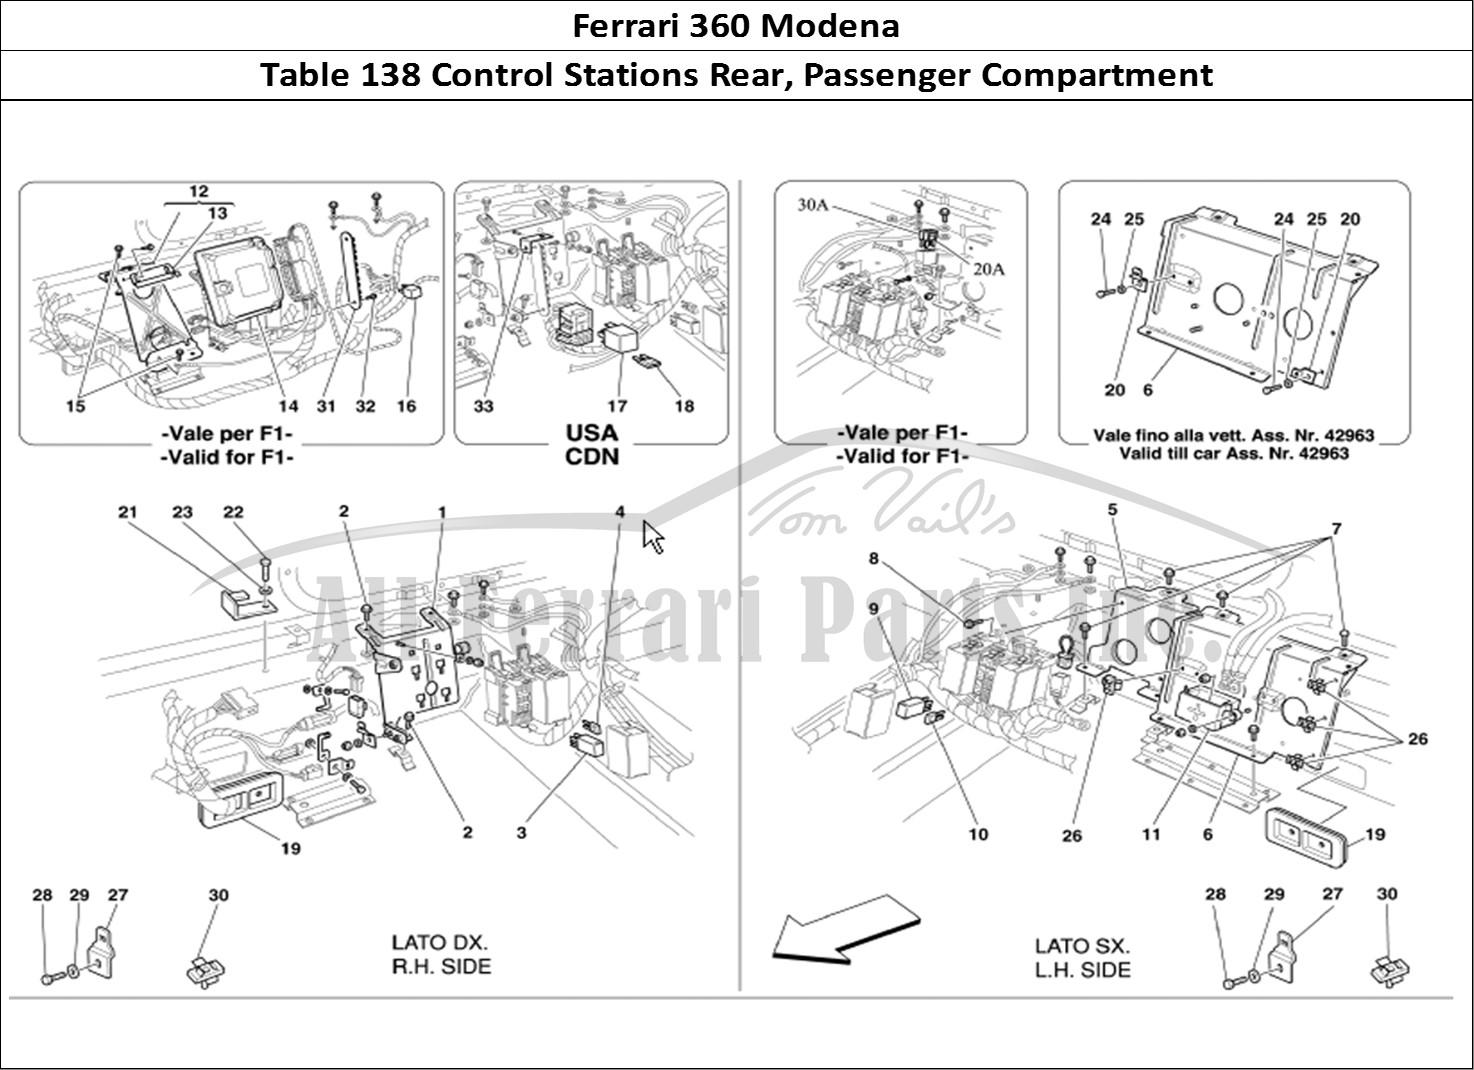 buy original ferrari 360 modena 138 control stations rear. Black Bedroom Furniture Sets. Home Design Ideas